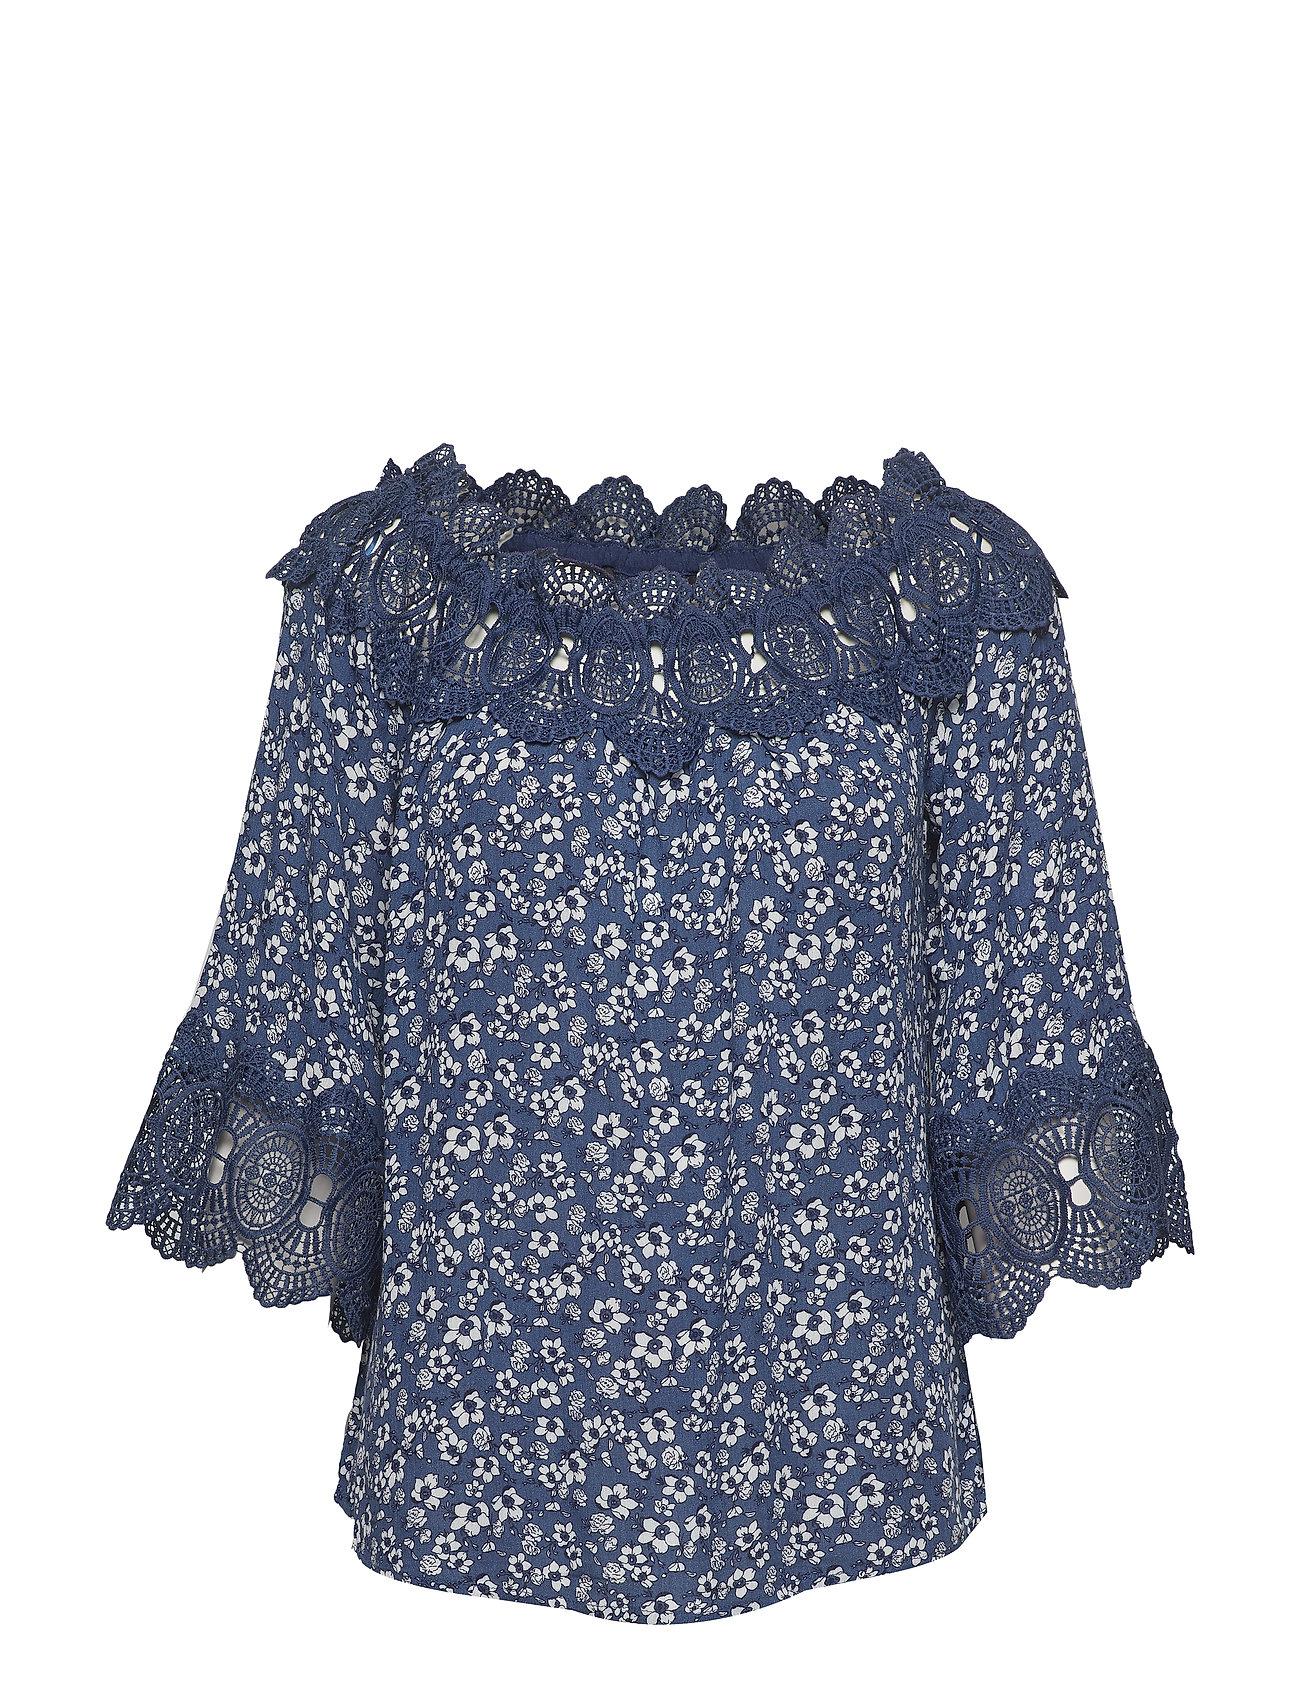 Cream Bea print blouse - DEPTHS MARINE / MARINE LACE